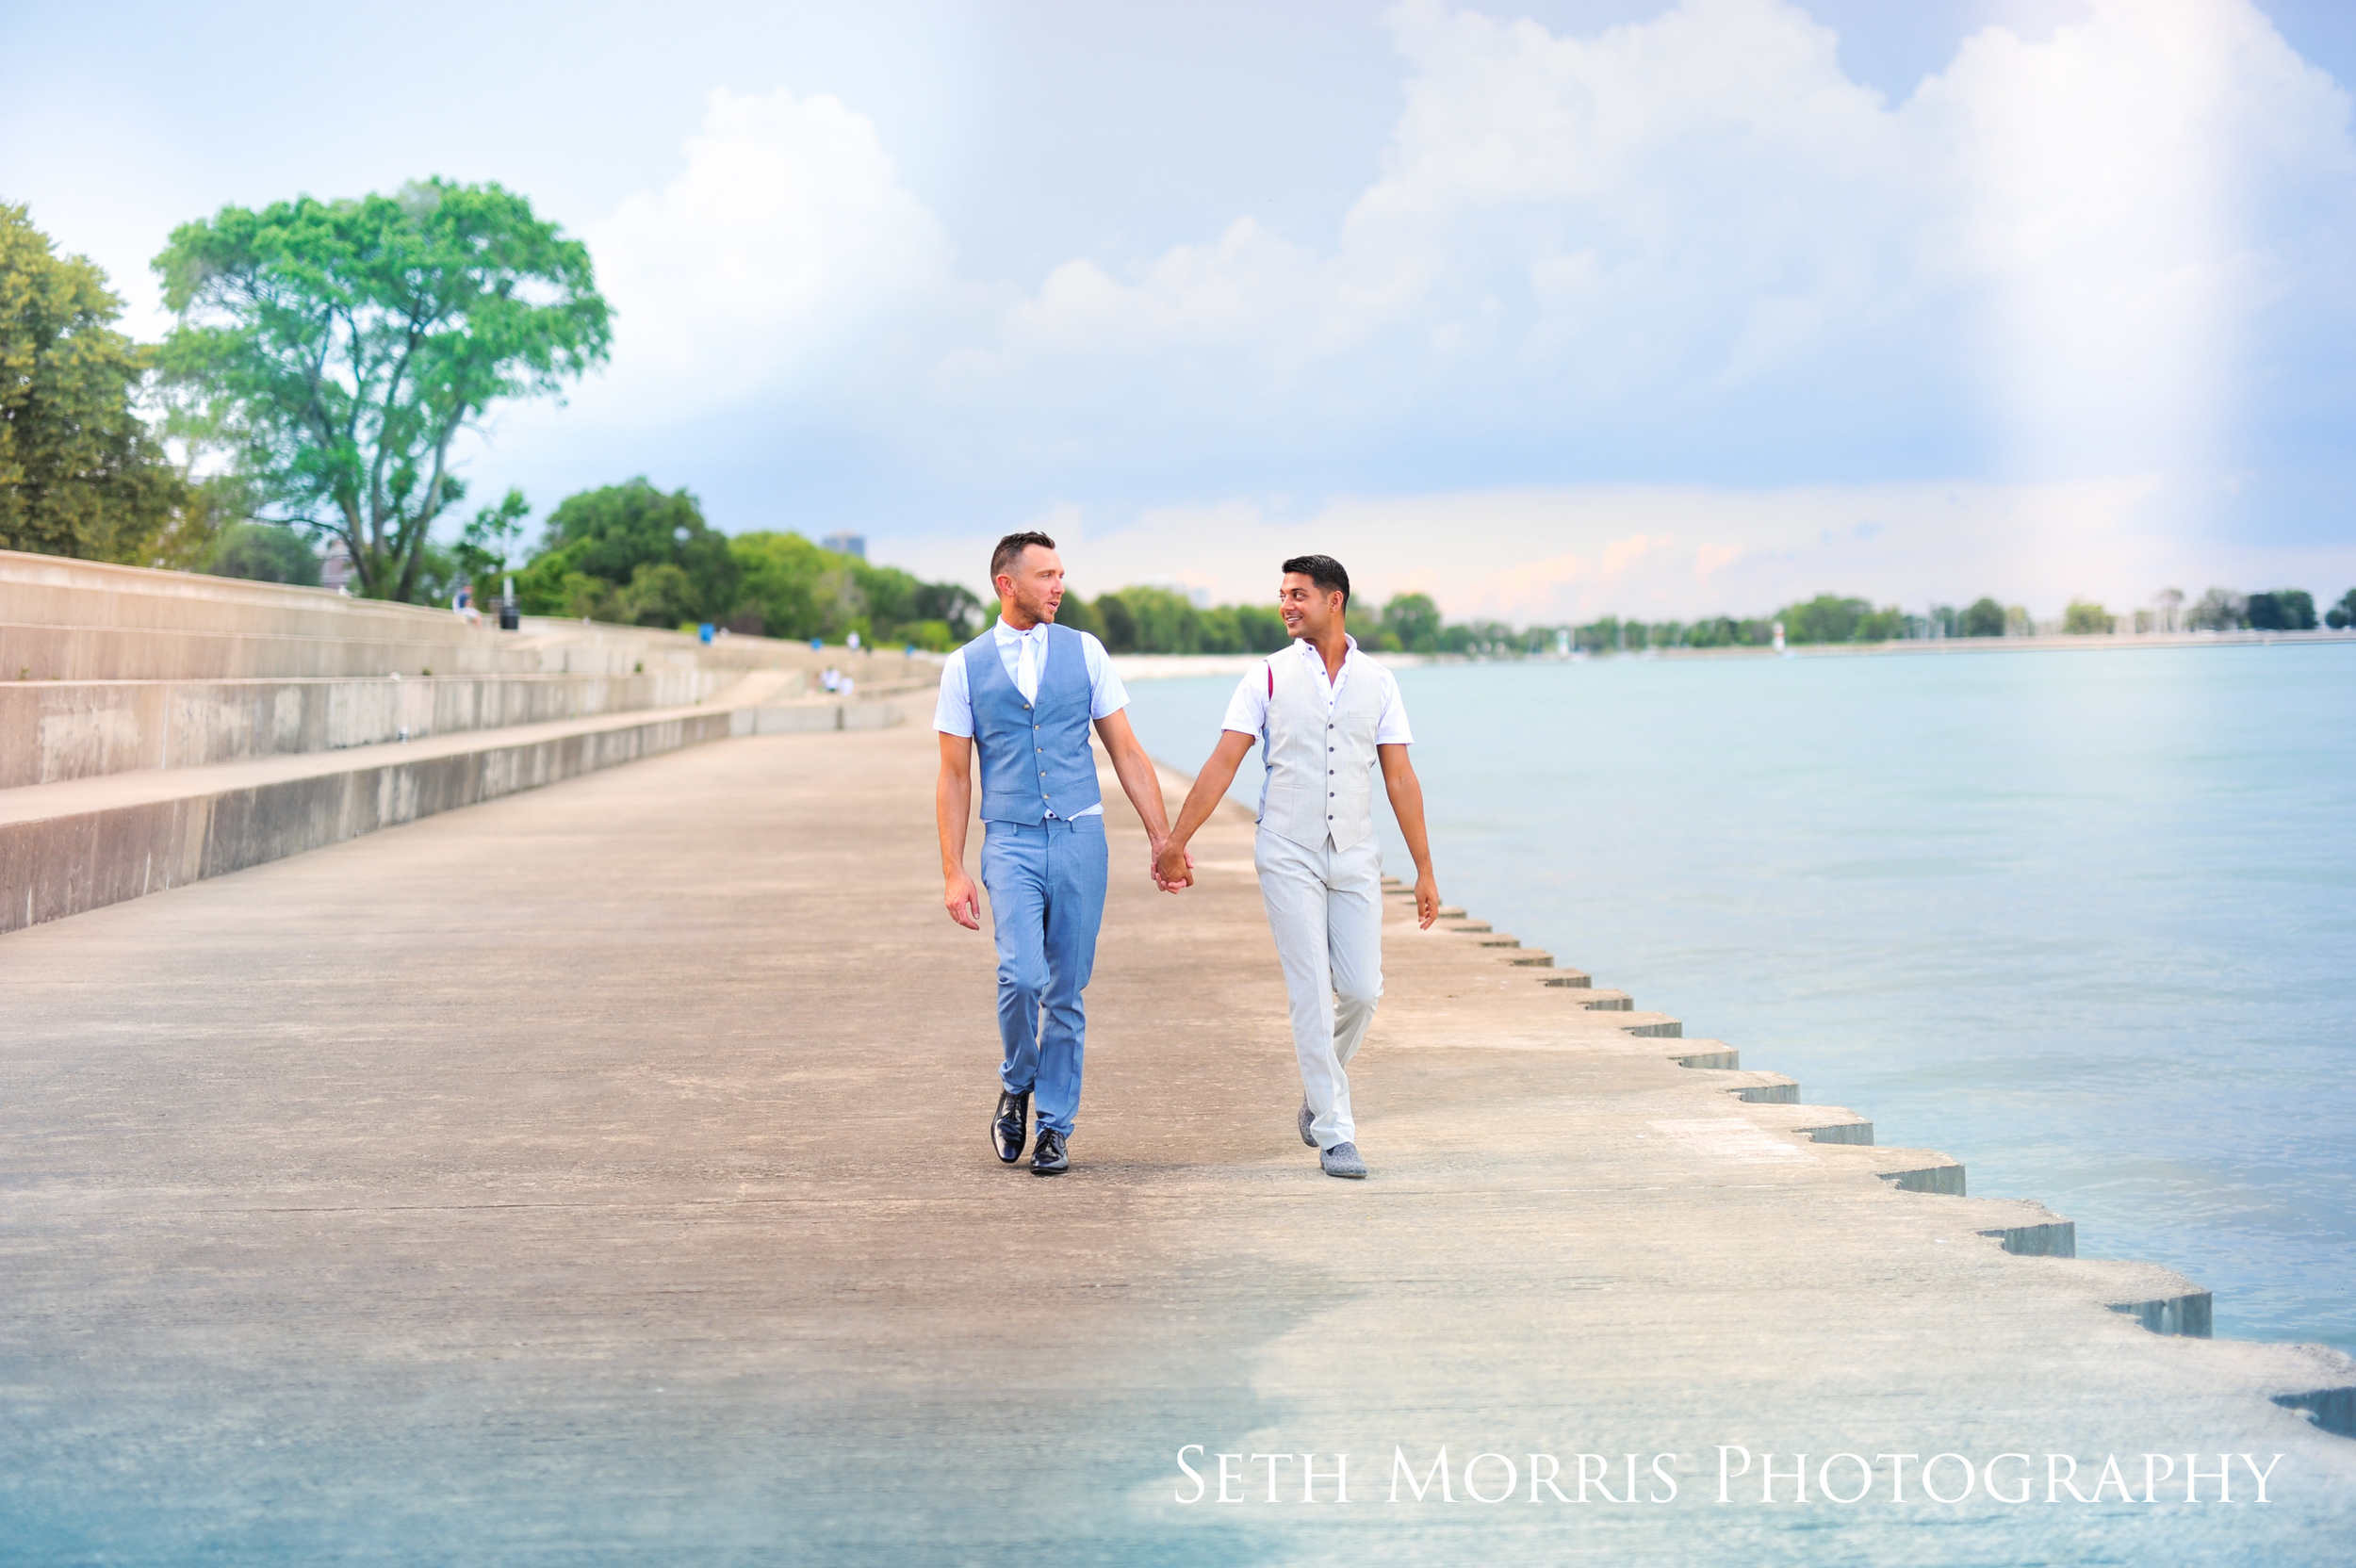 chicagoland-engagement-photographer-same-sex-wedding-2.JPG